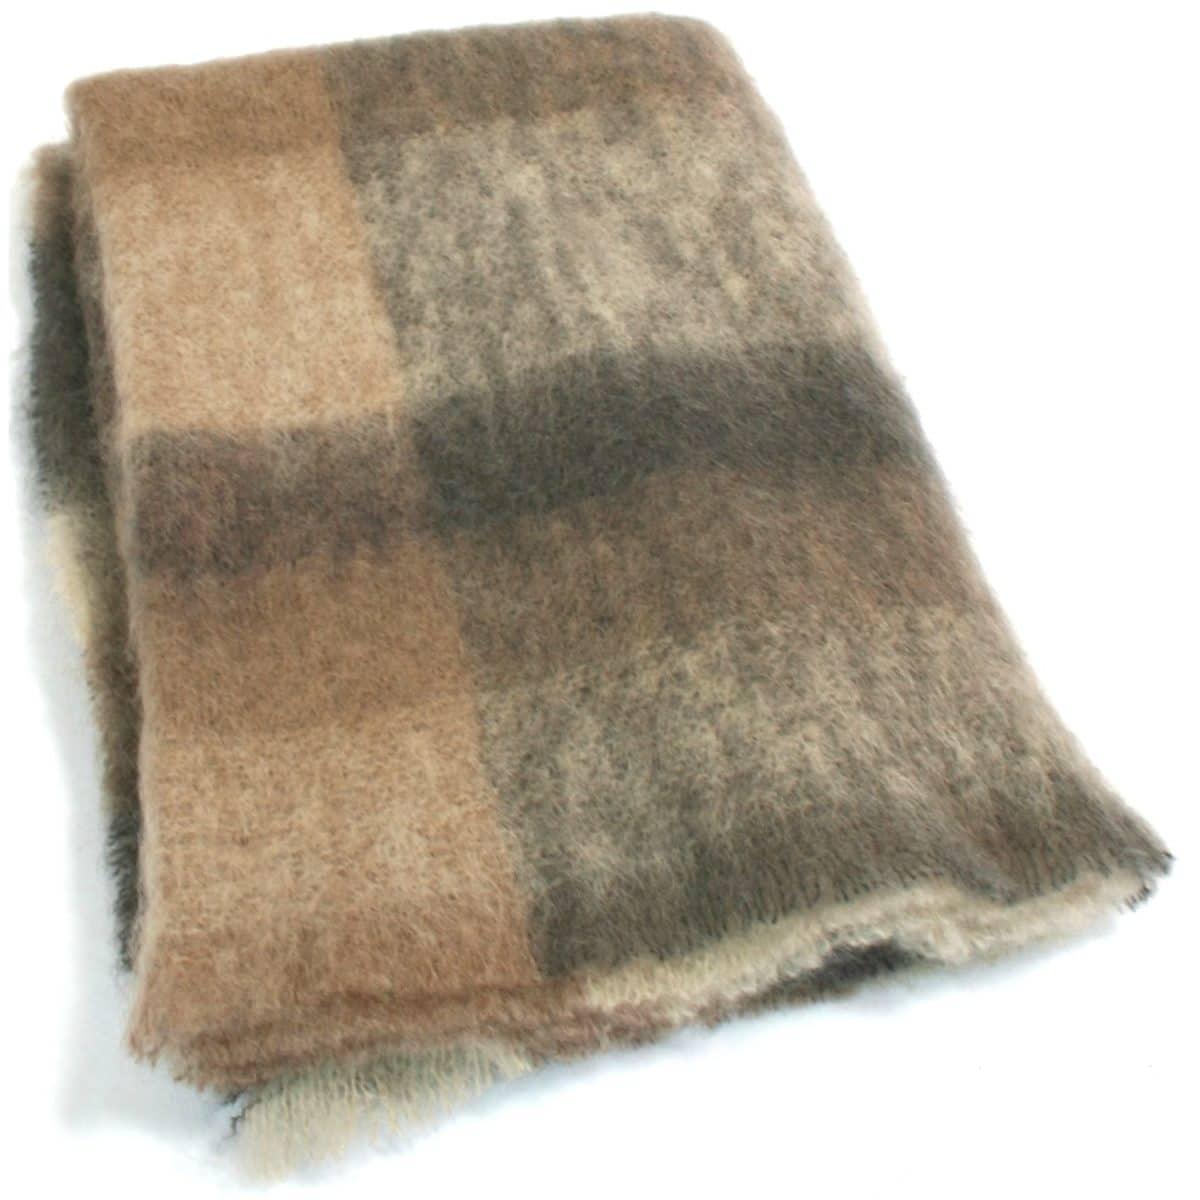 Mohair Blanket - Tan Check